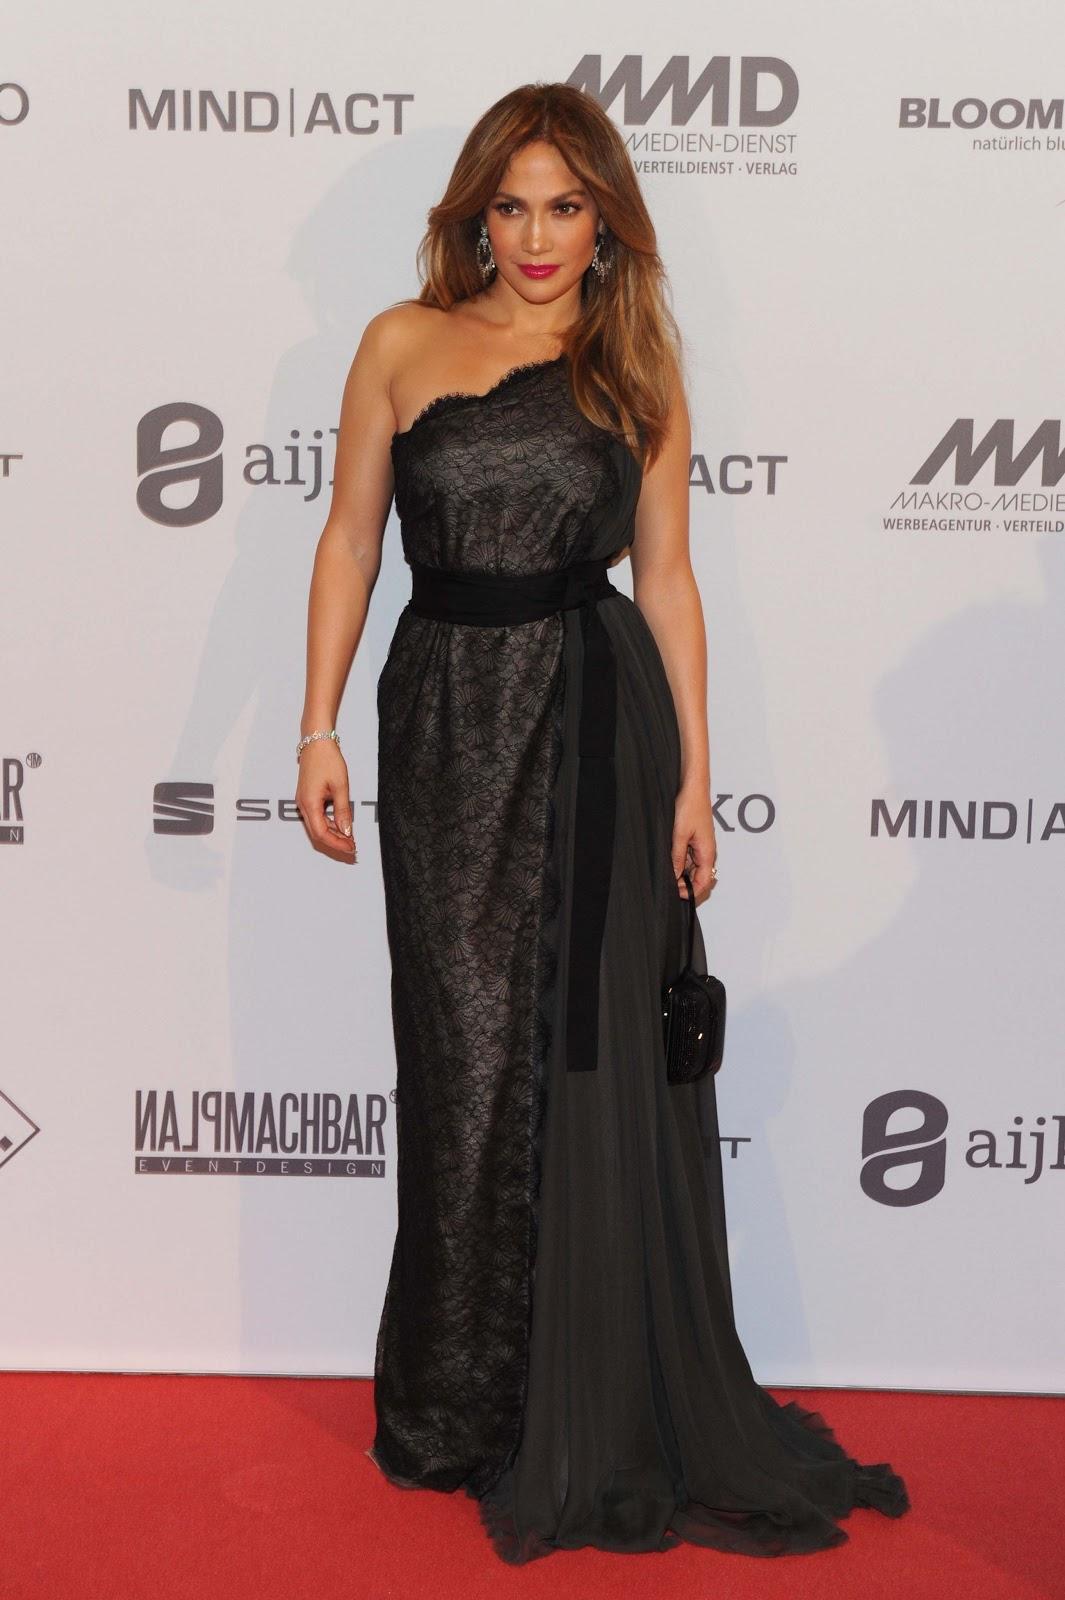 http://4.bp.blogspot.com/-qGsWczKBq6o/UIzCuP2WtYI/AAAAAAAAWvU/_qEQfKyubis/s1600/Jennifer+Lopez++attends+2012+UNESCO+Charity+Gala+2012+in+D%C3%BCsseldorf+October_27_2012+-0+1.jpg